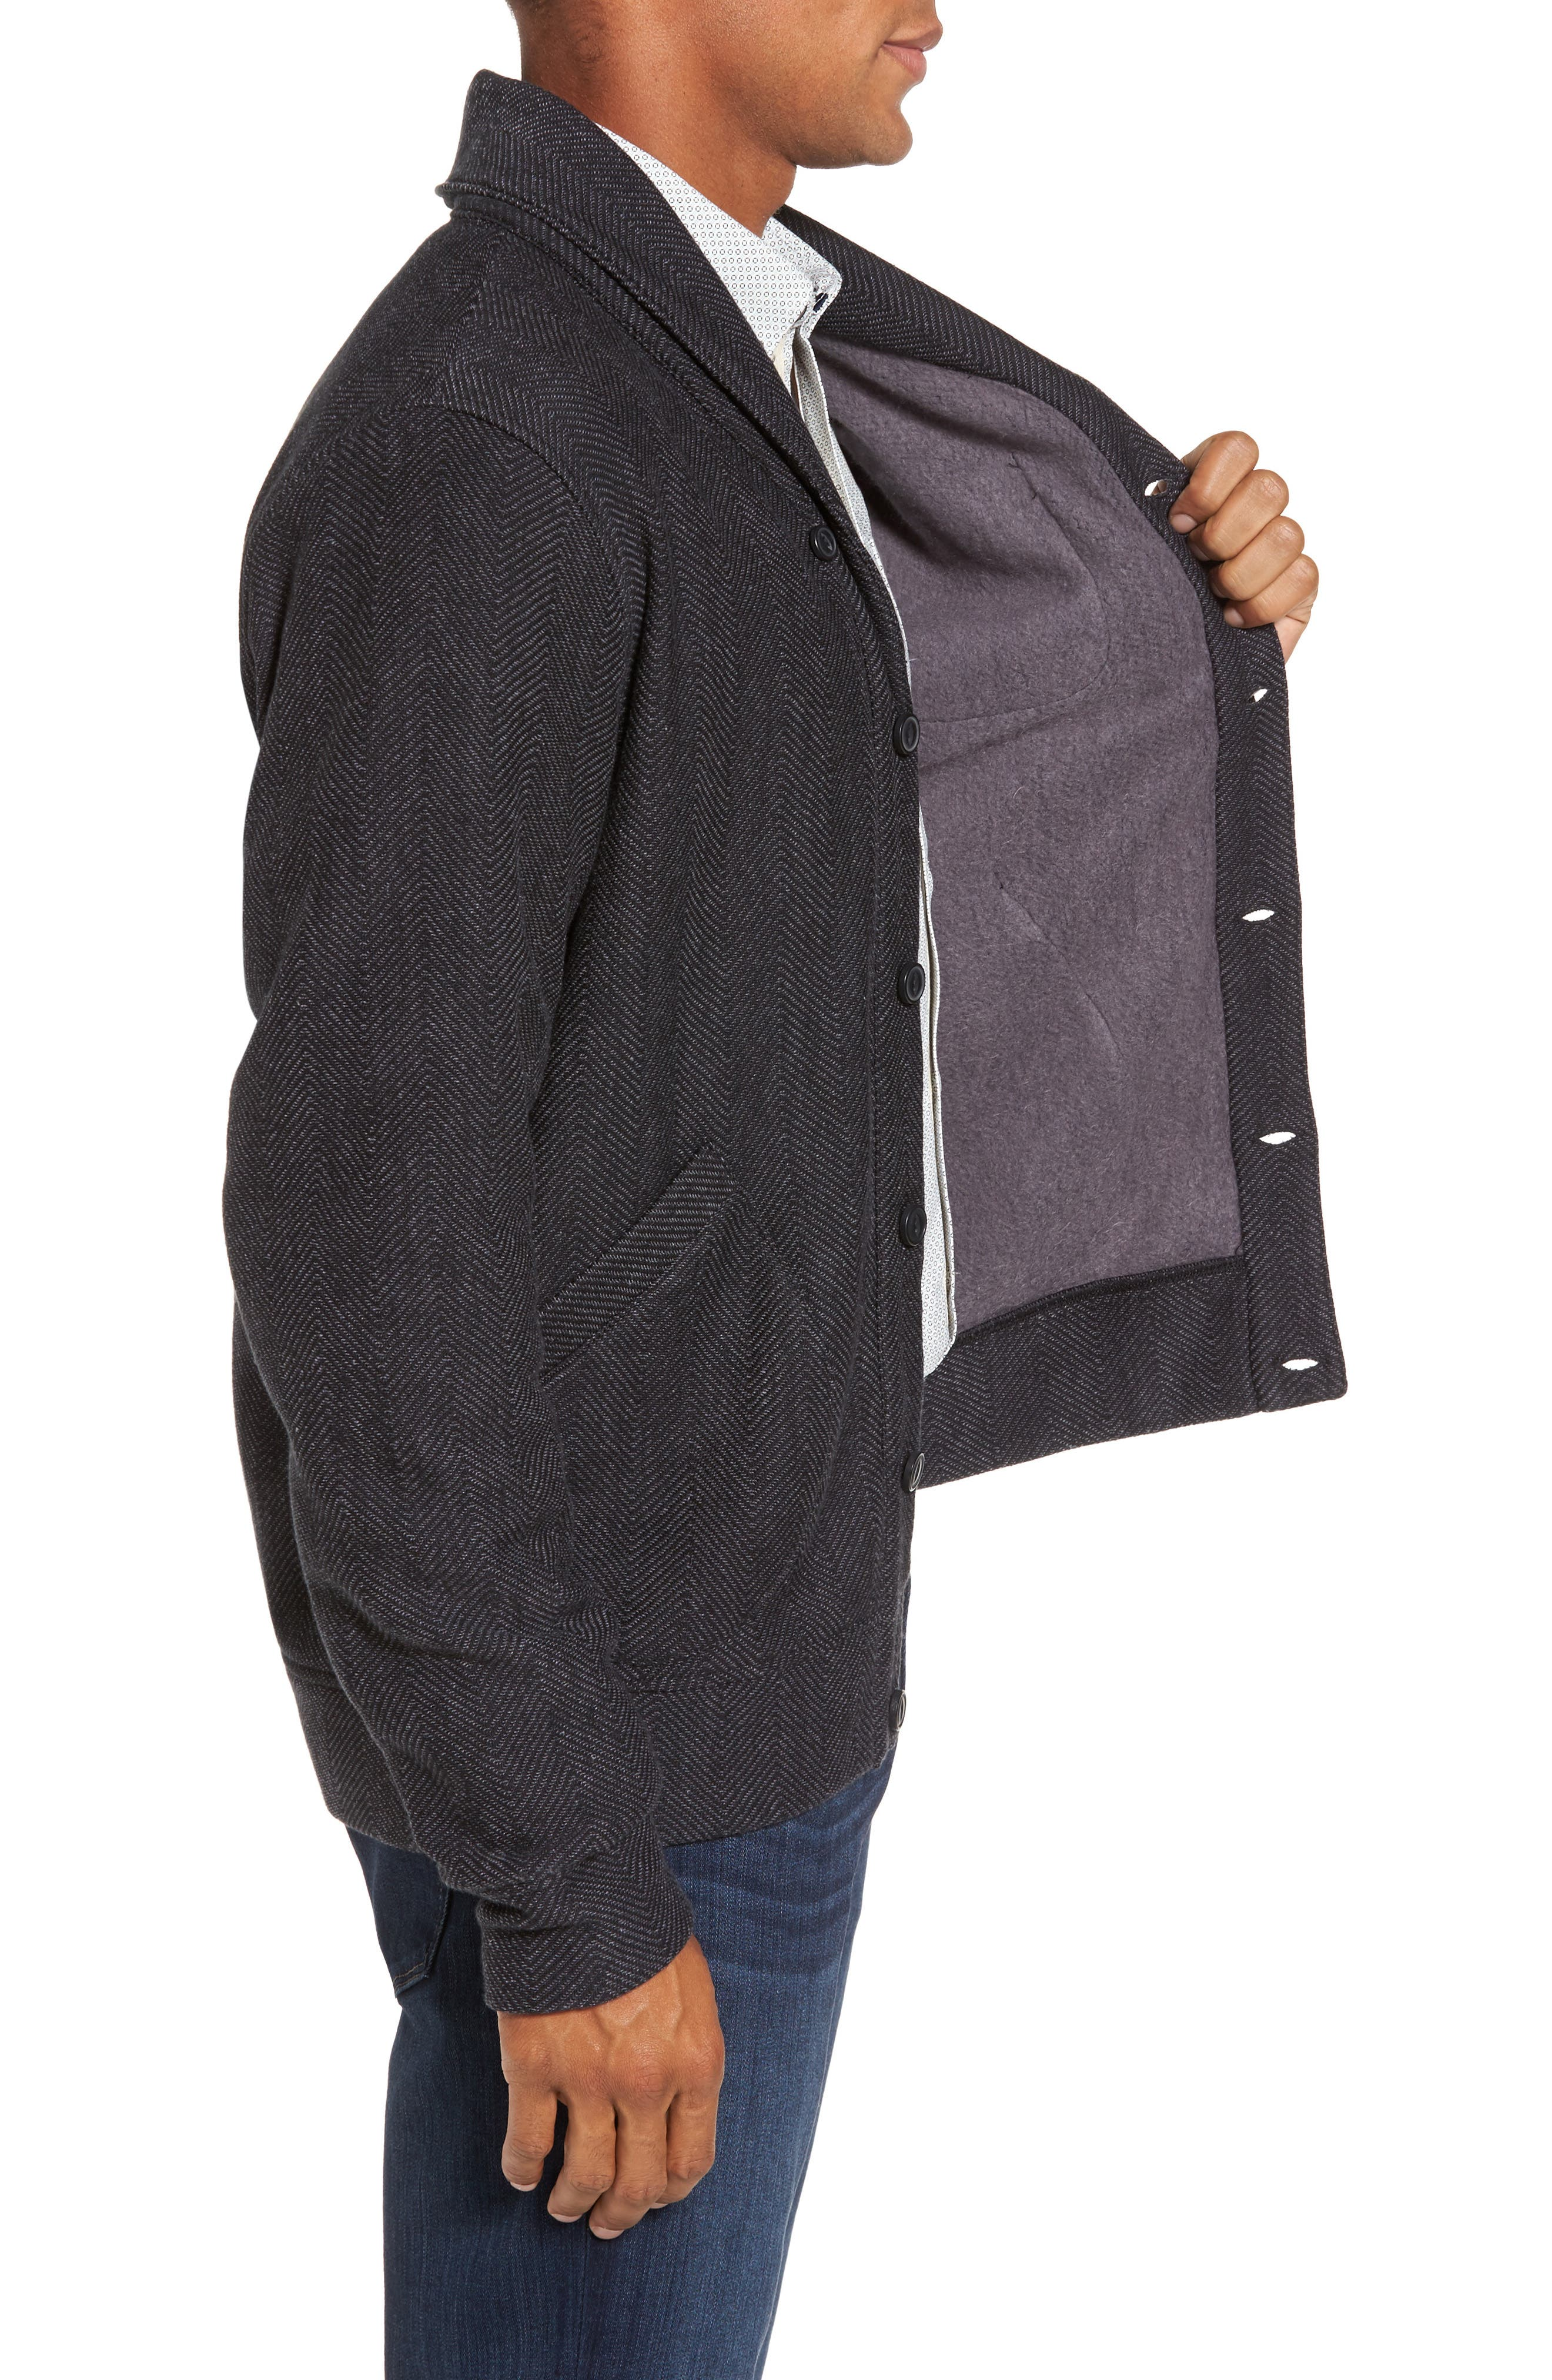 Alternate Image 3  - Nordstrom Men's Shop Fleece Lined Shawl Collar Cardigan